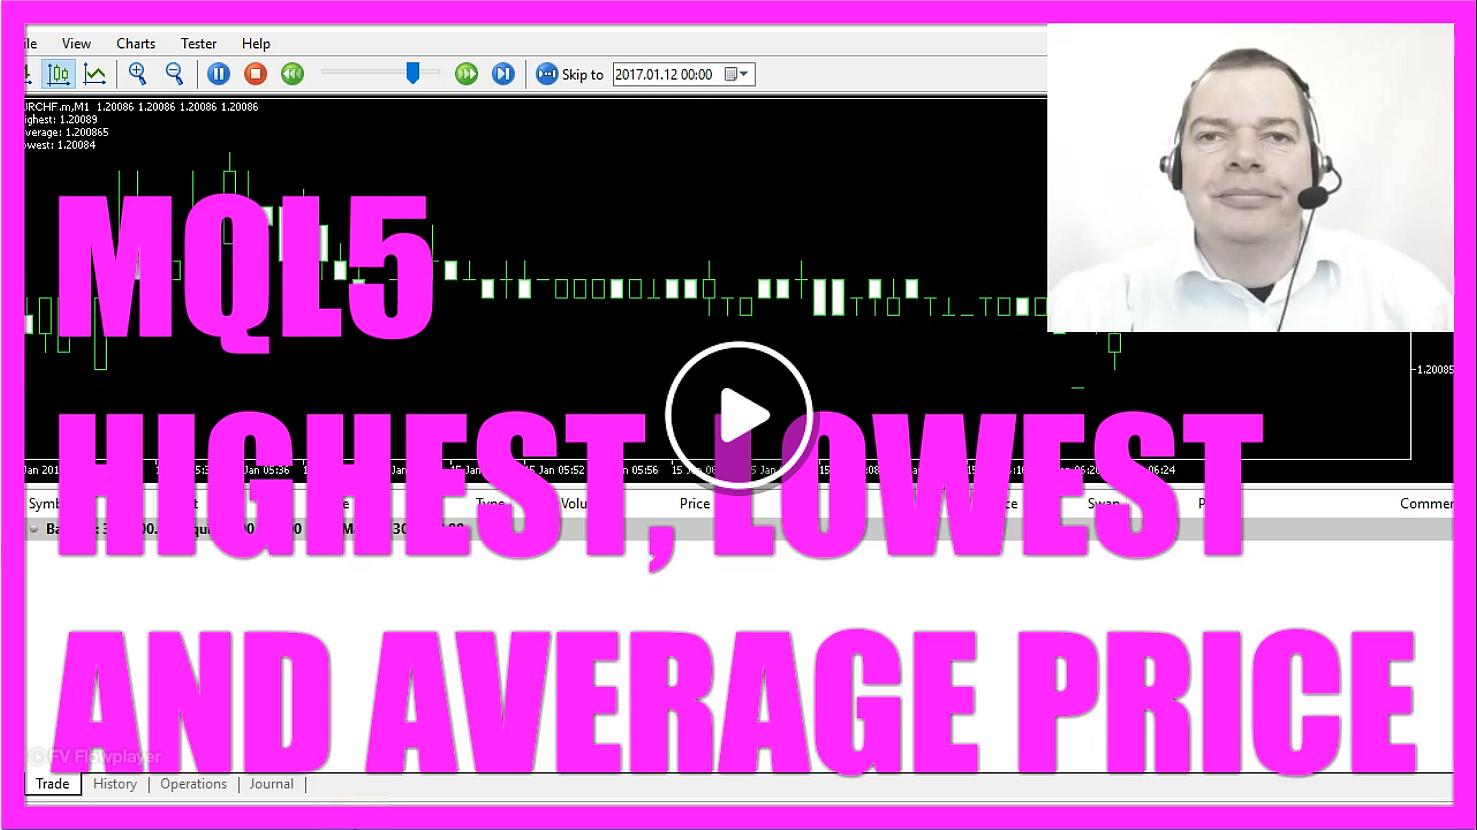 MQL5 TUTORIAL - HIGHEST LOWEST AND AVERAGE PRICE - MQL5 Tutorial